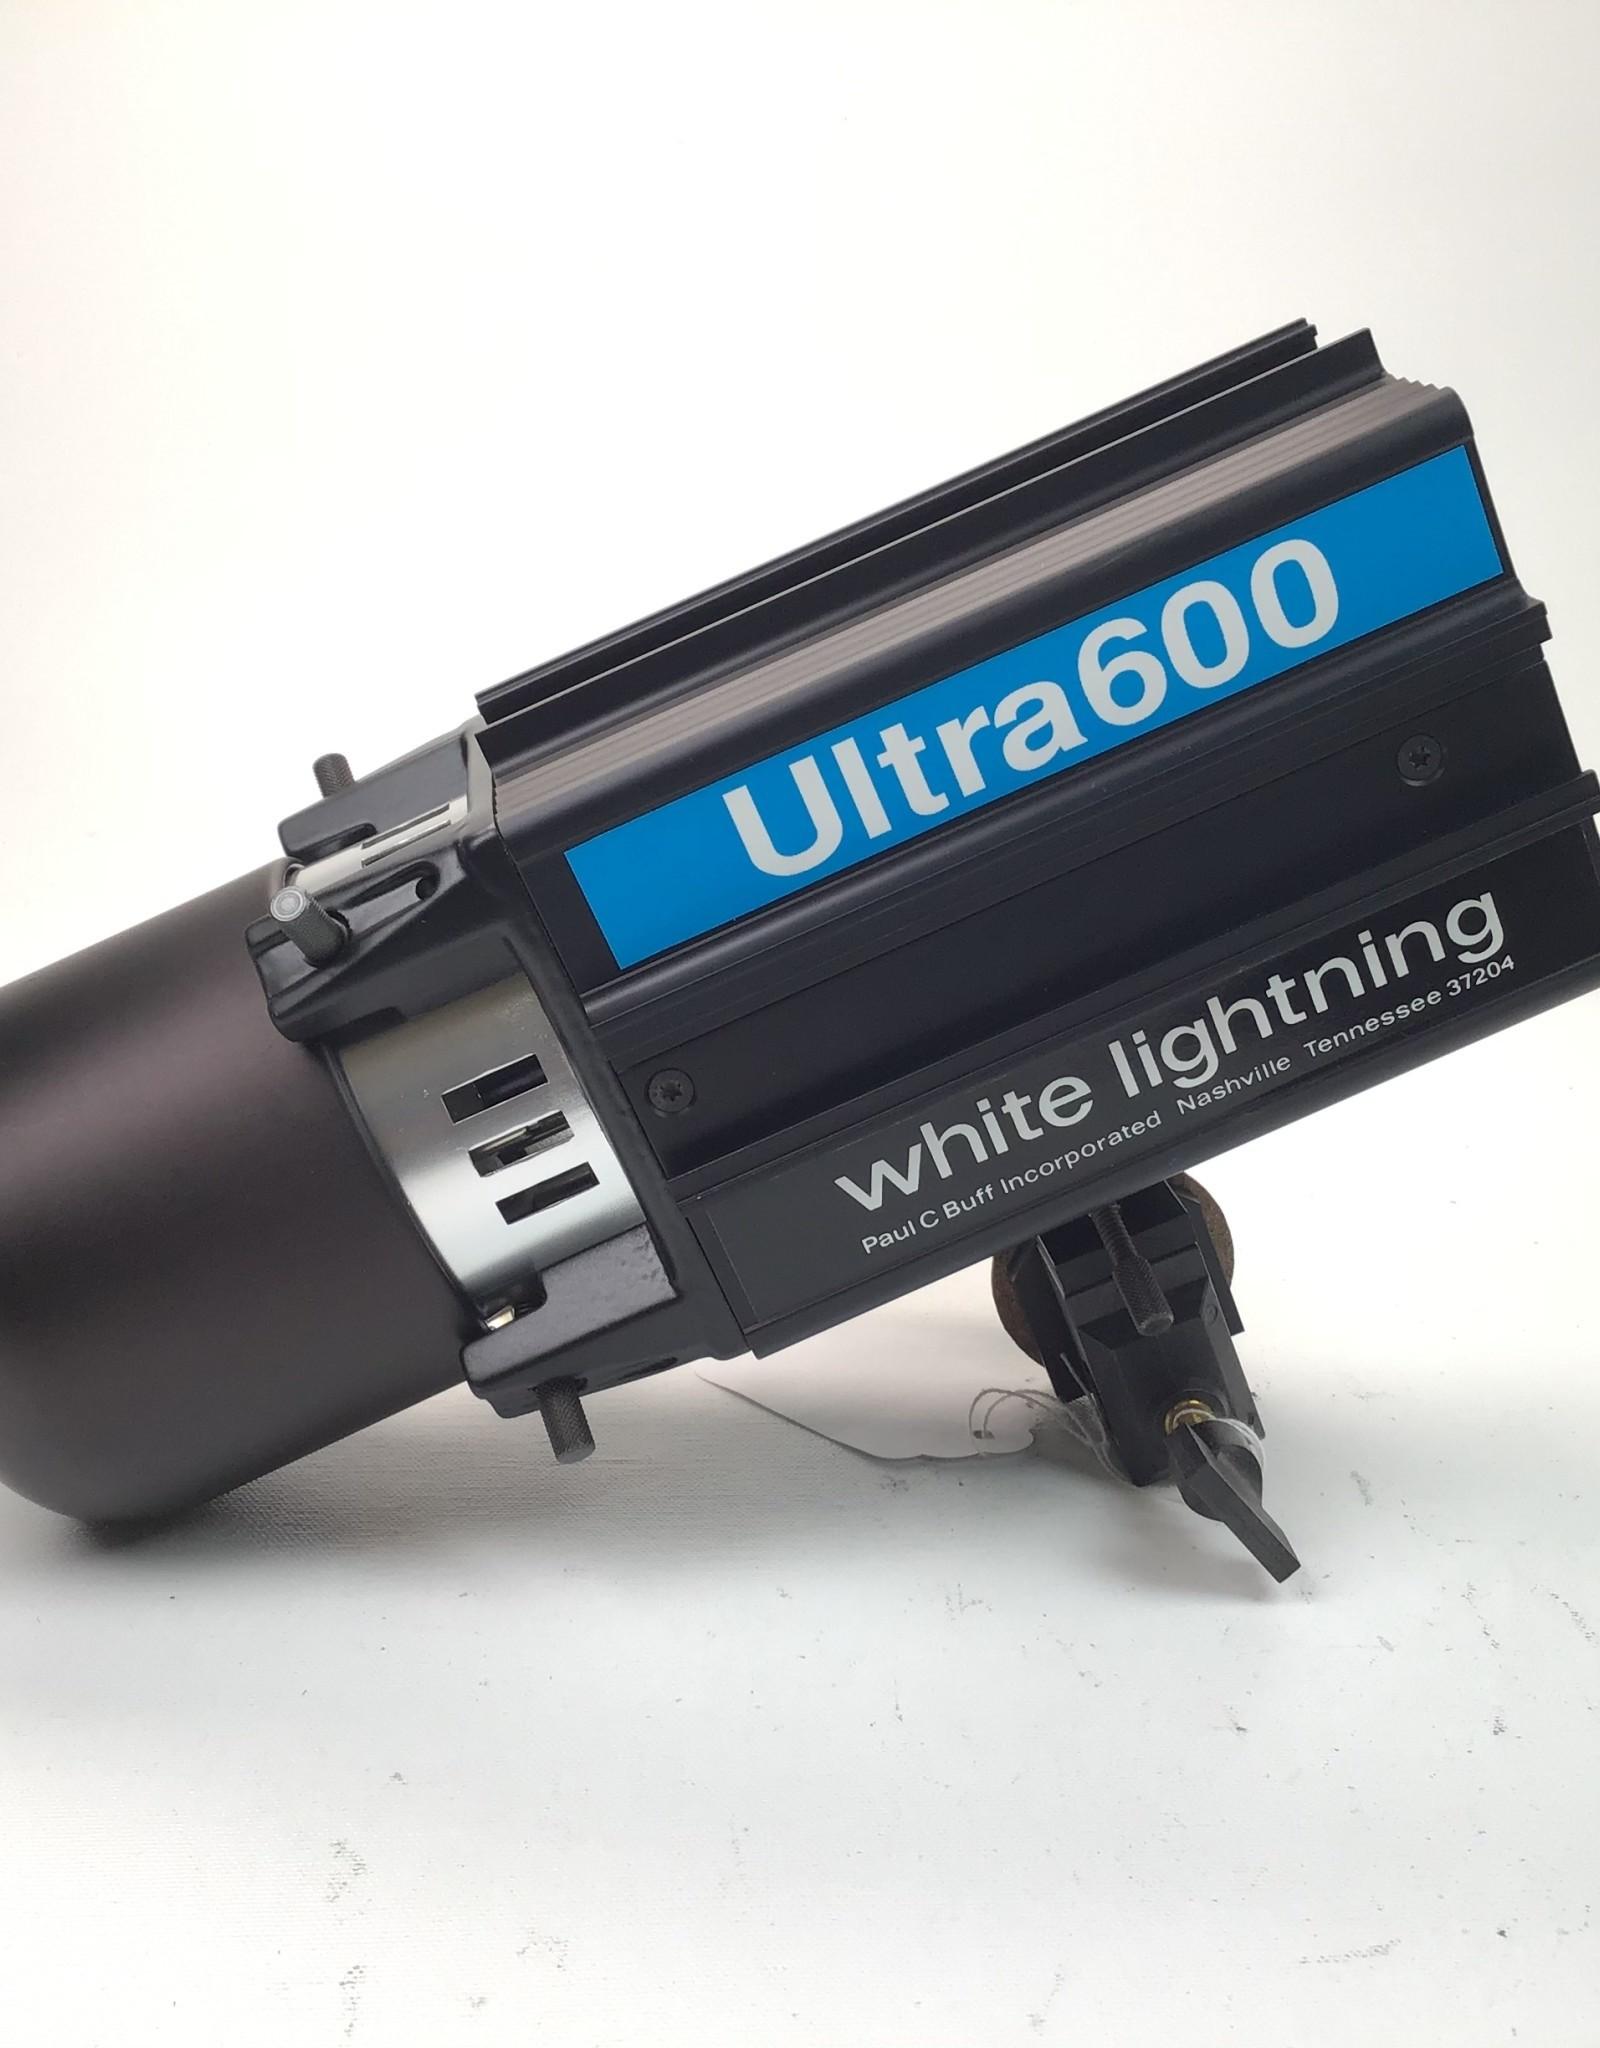 Paul C. Buff White Lightning Ultra 600 Monolight Used Good